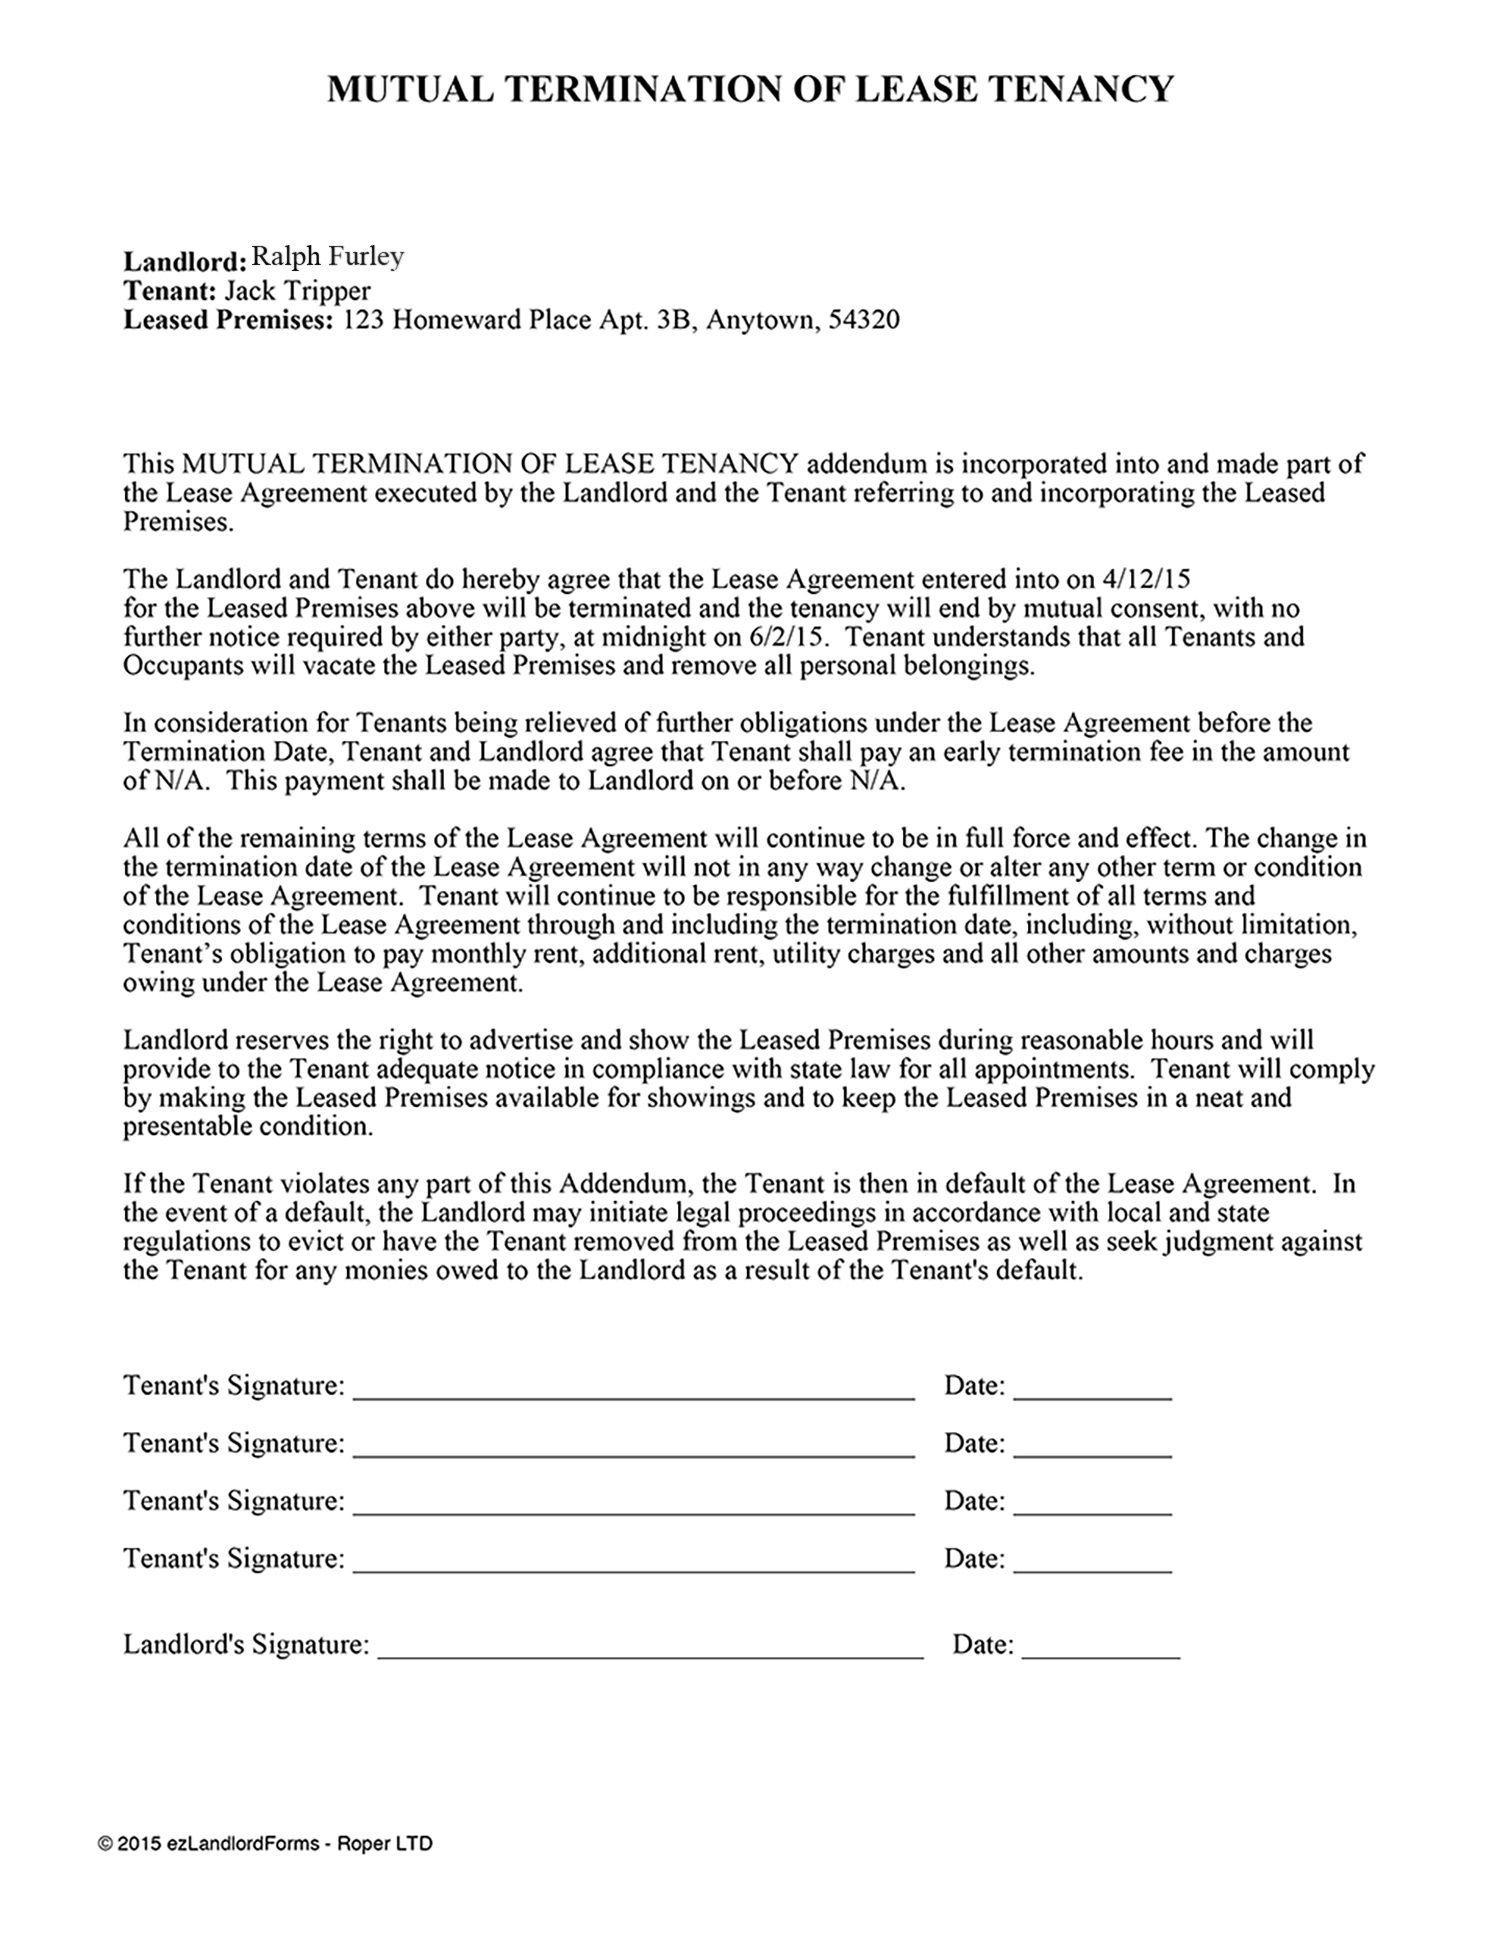 005 Unforgettable Addendum Form For Rental Agreement Photo Full